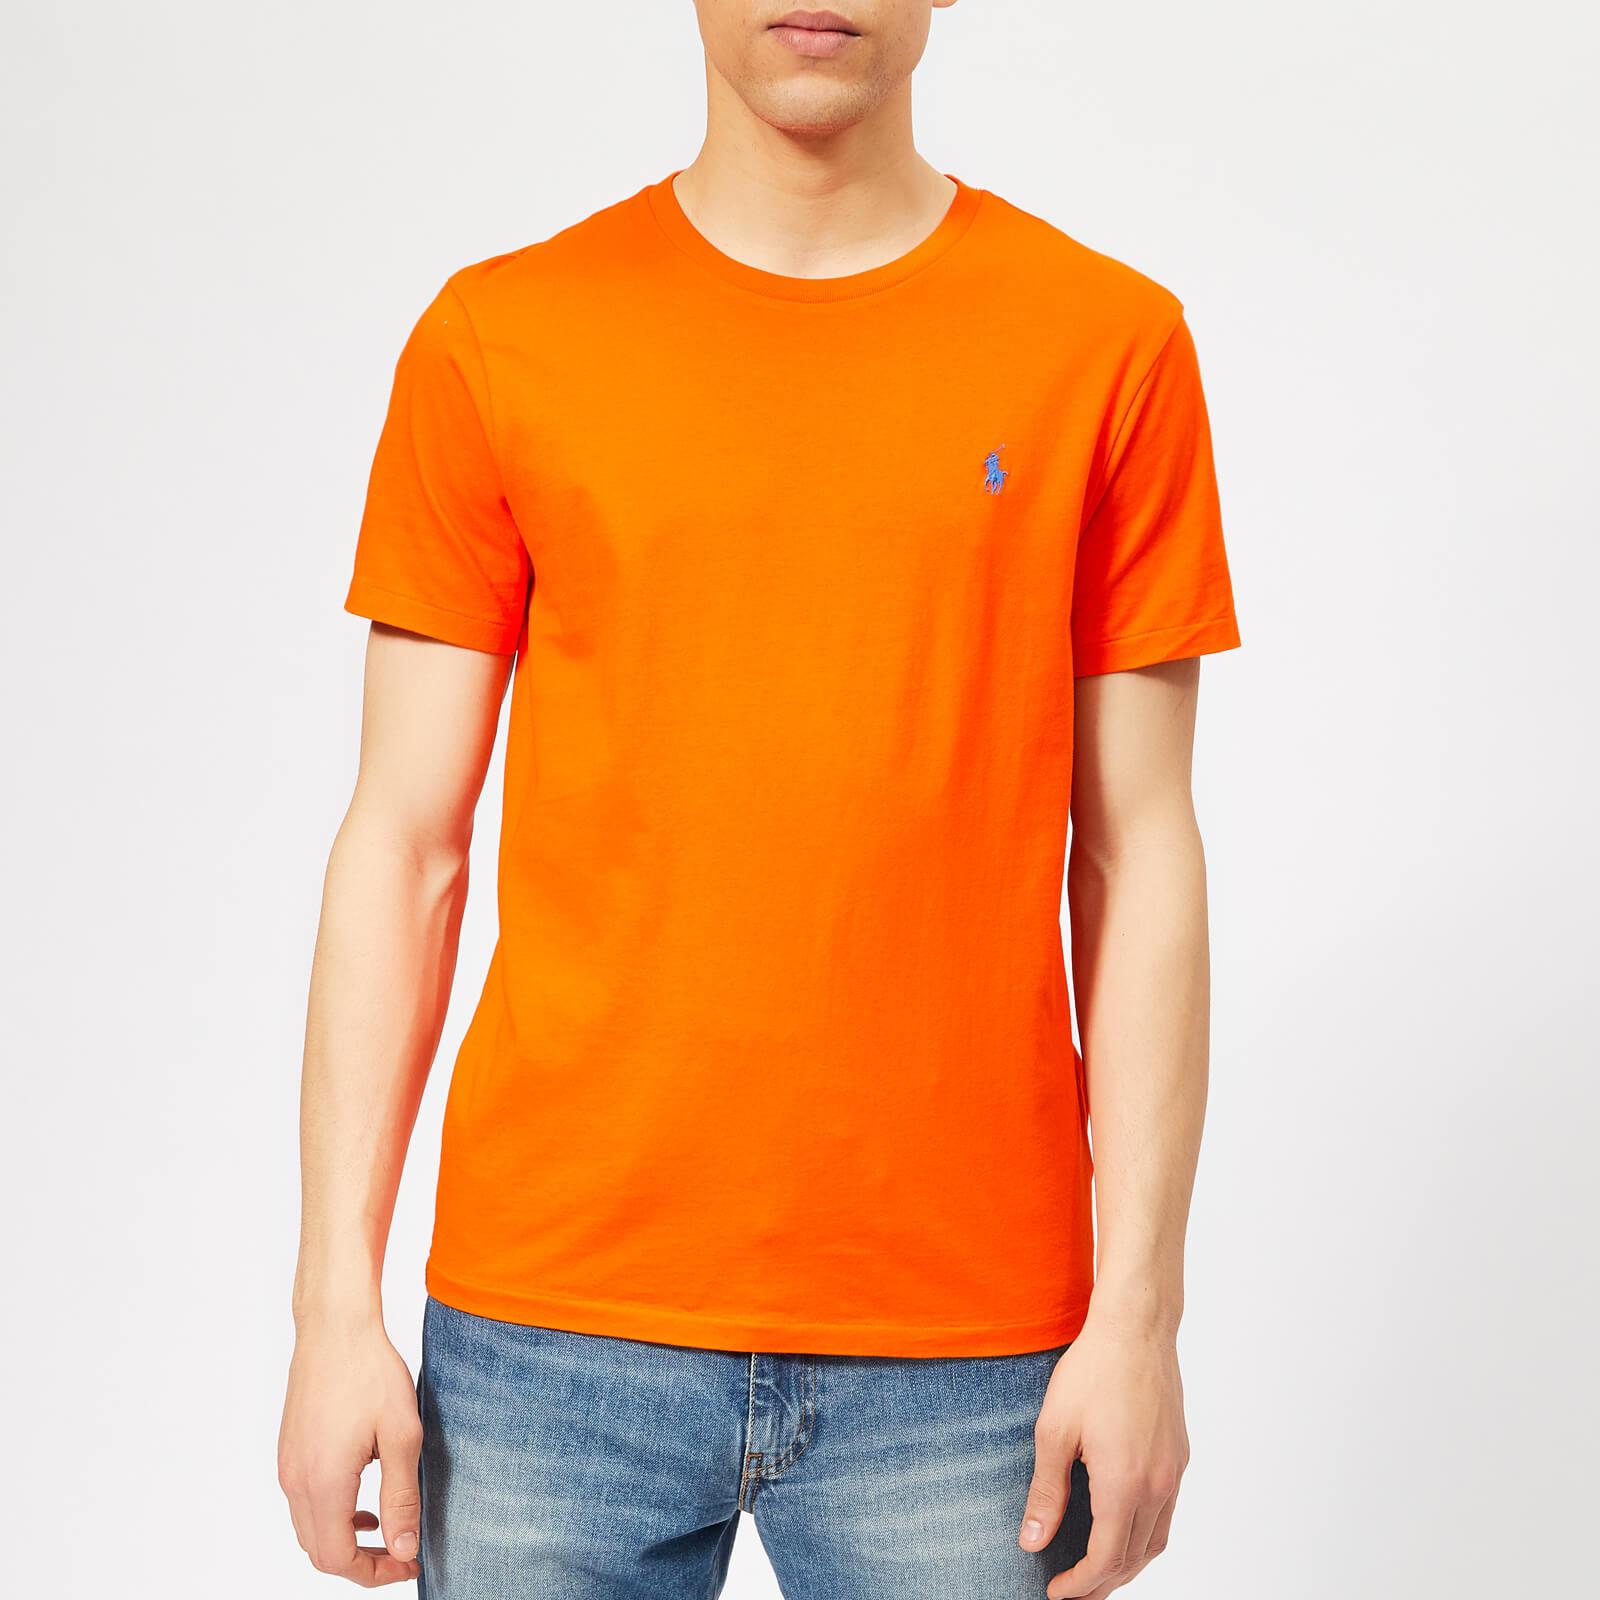 f0f0fbc3c9c Polo Ralph Lauren Men s Basic T-Shirt - Sailing Orange - Free UK Delivery  over £50